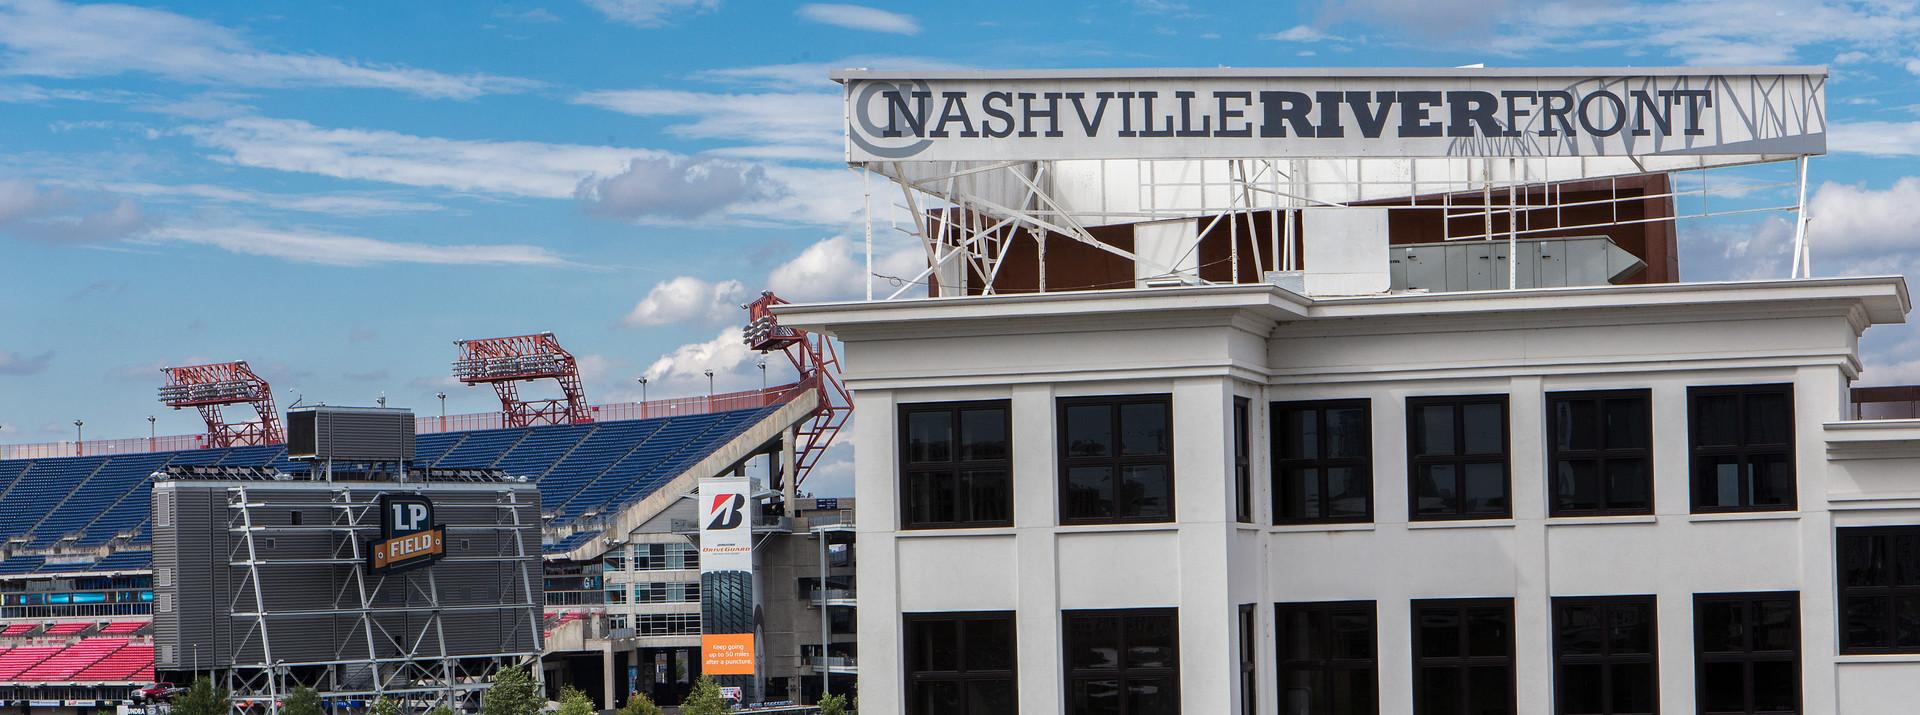 Nashville-Riverfront.jpg